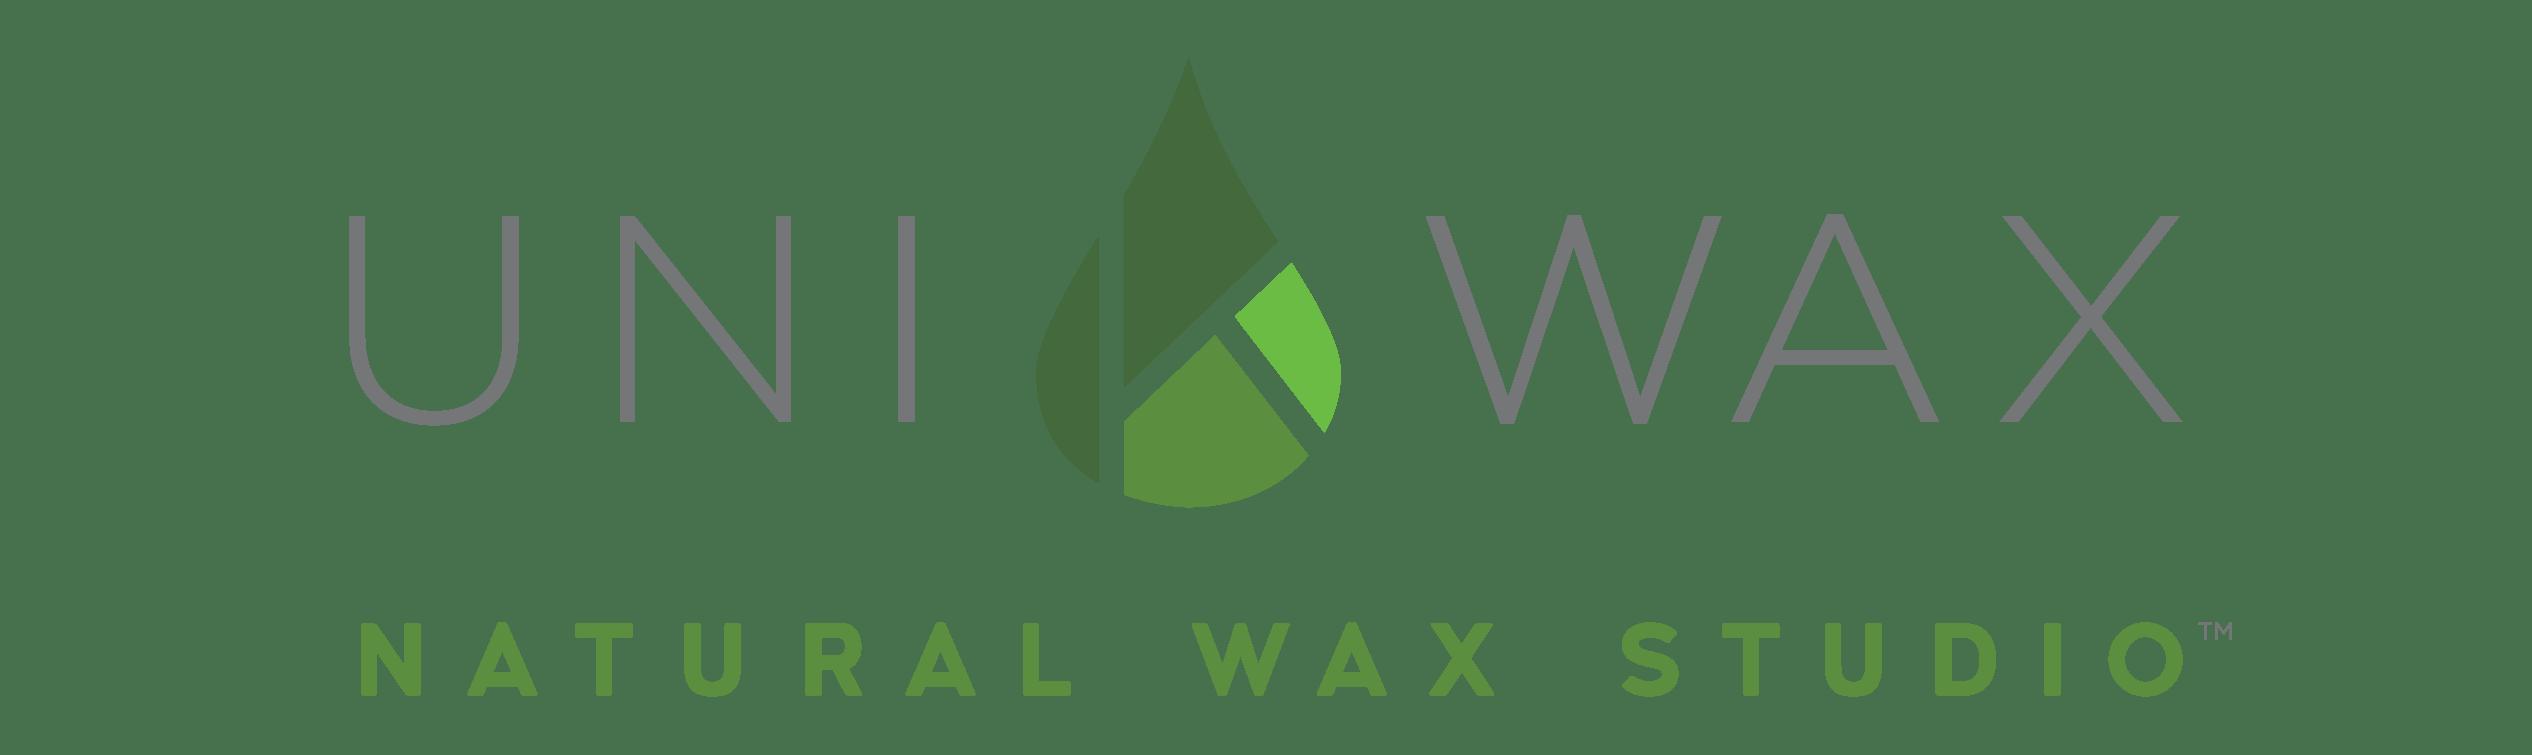 home uni k wax studios